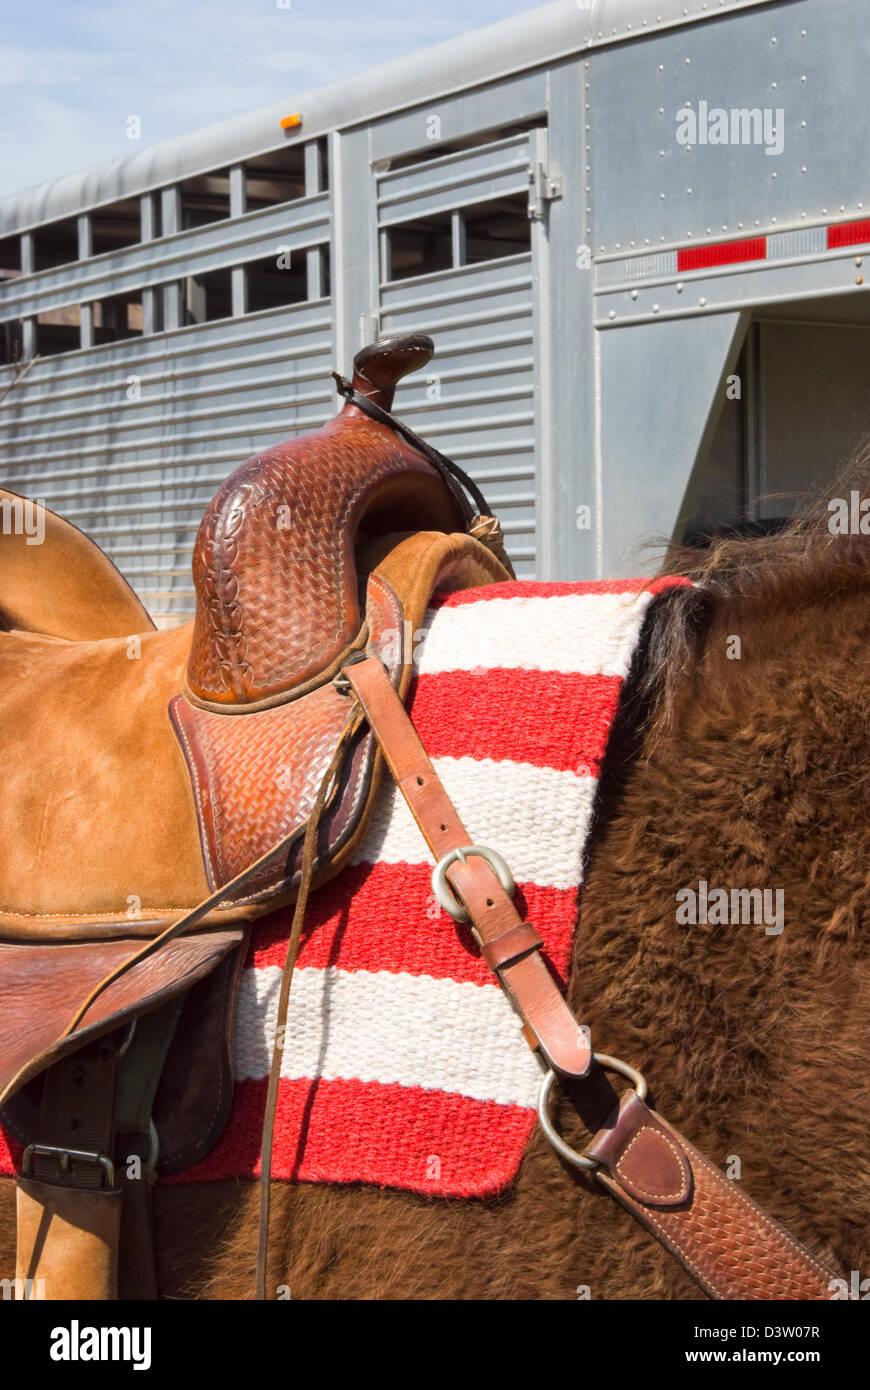 Horse under western saddle ready for horseback rider, American flag blanket under and trailer behind. - Stock Image